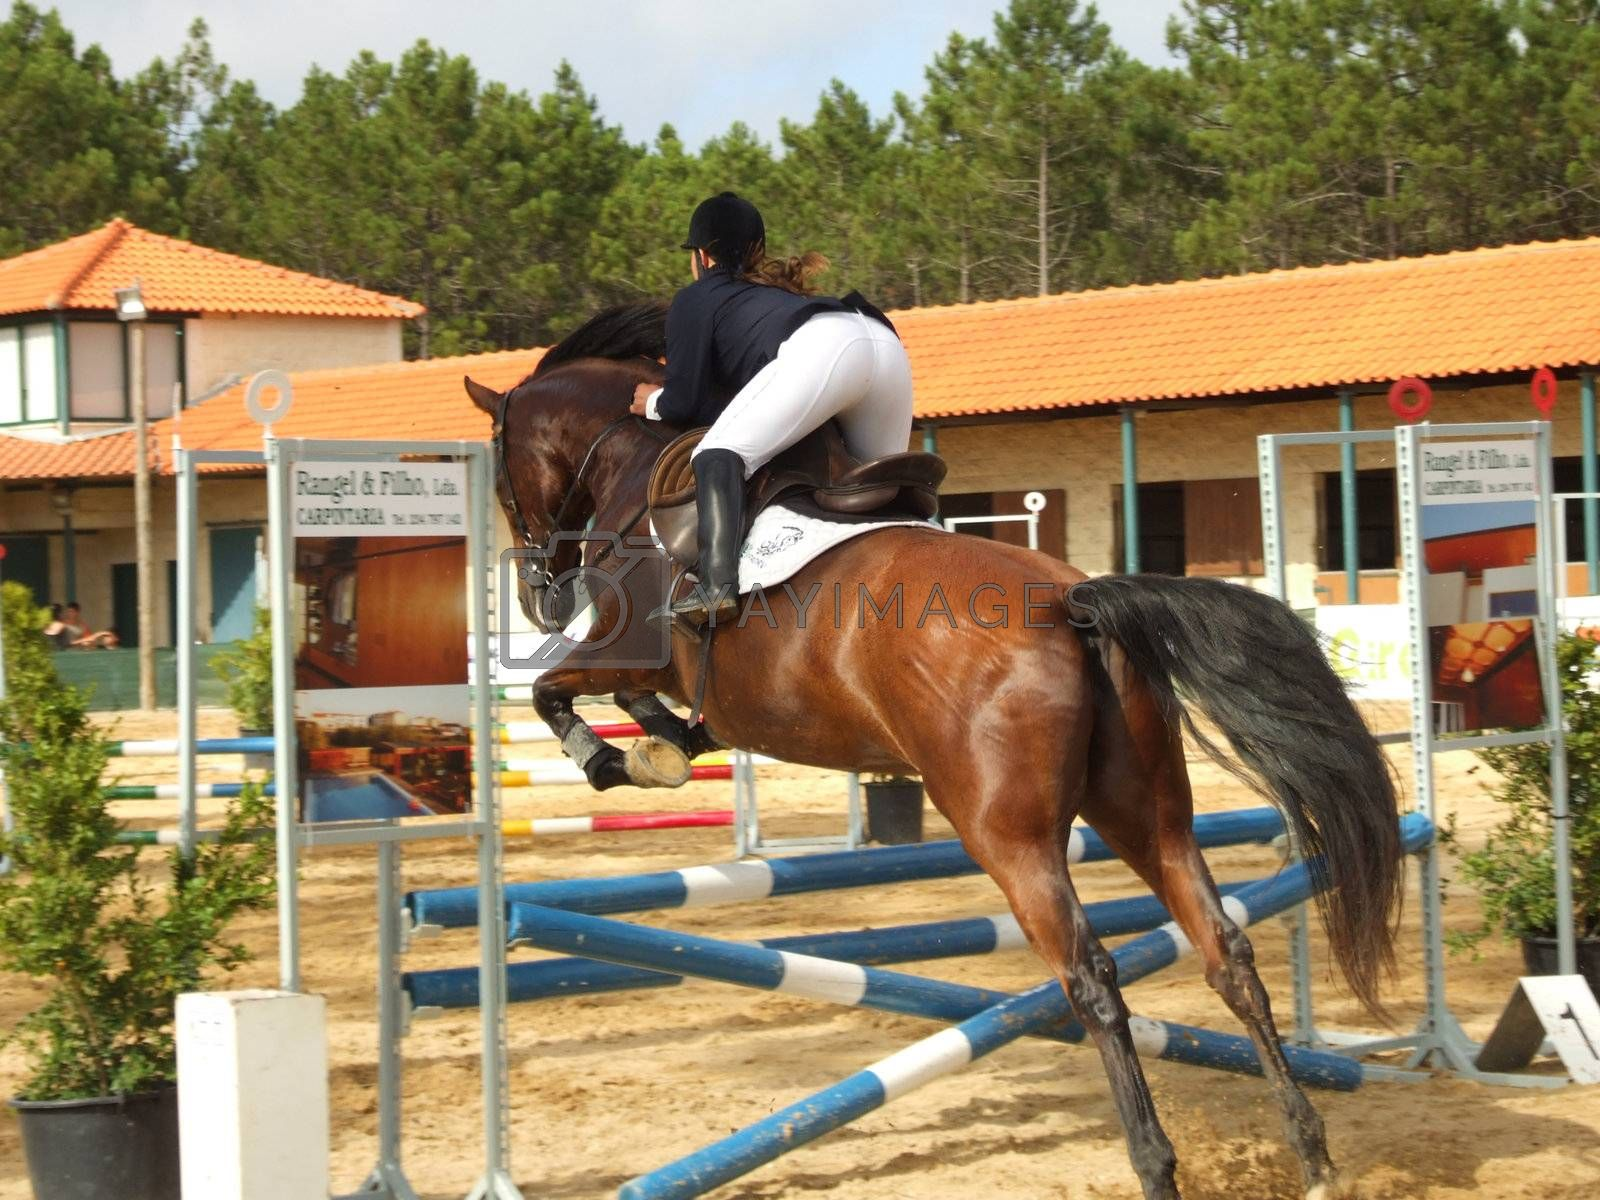 Horse jump by PauloResende